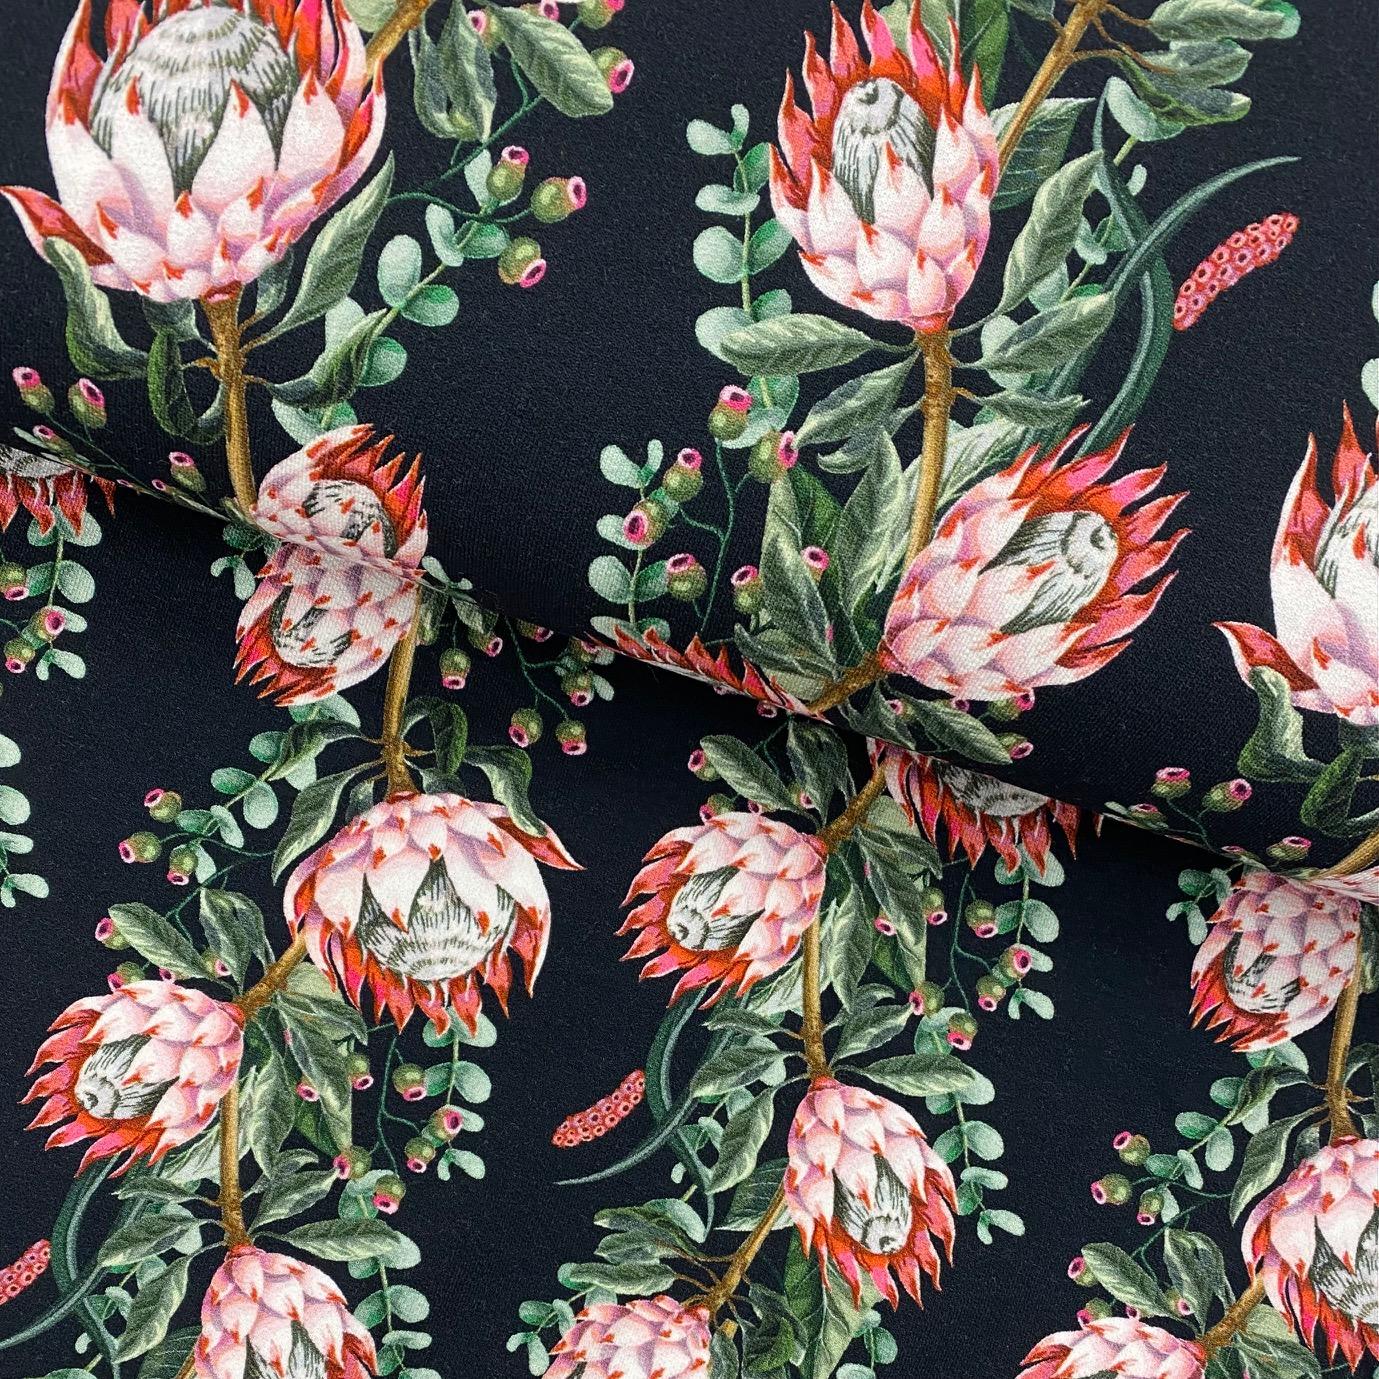 Viskosenjersey Crepe von FVJ, Blumen. Art. FVJ-2338